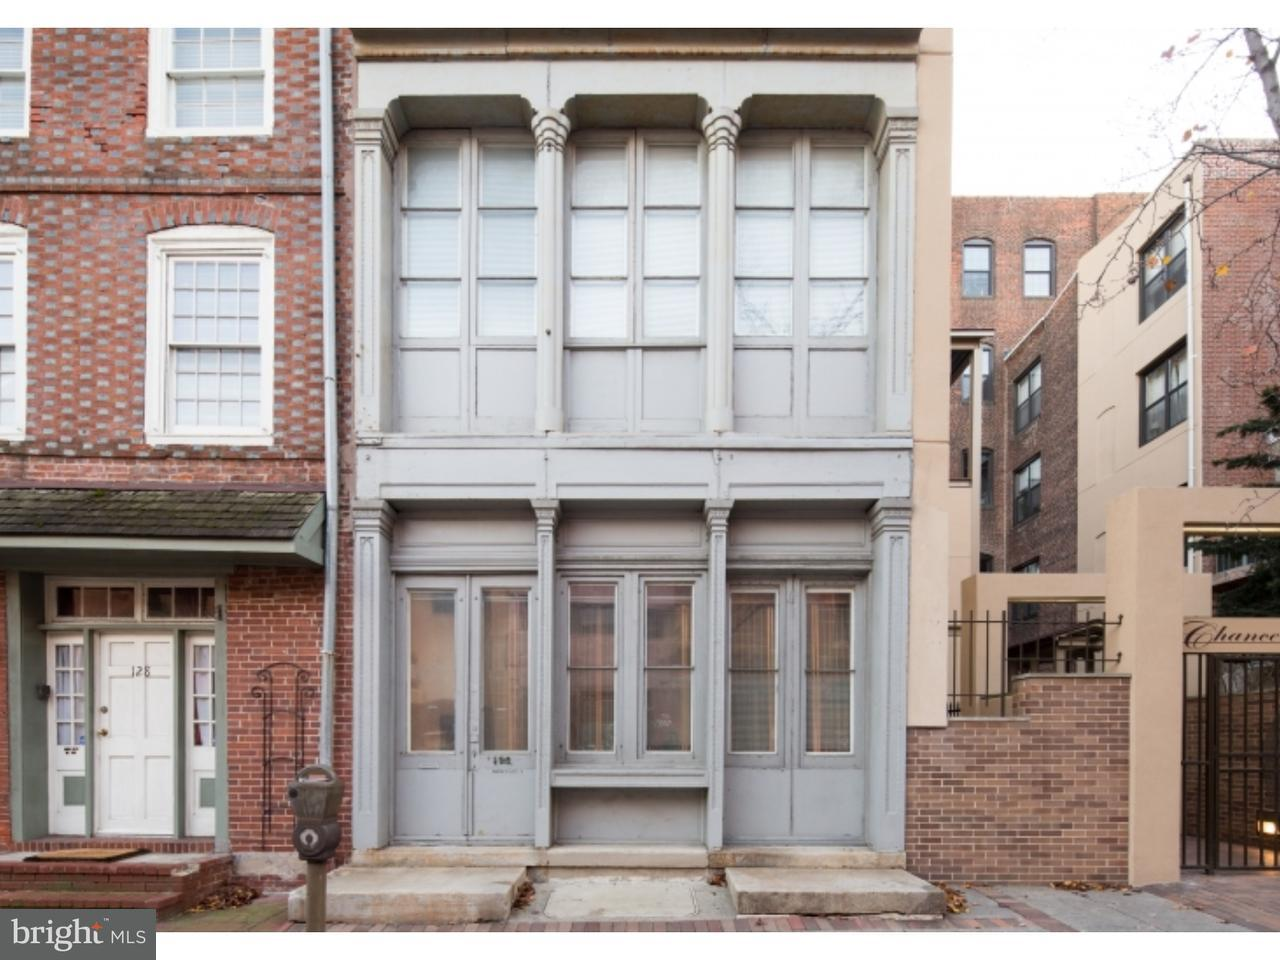 130  Arch Philadelphia, PA 19106